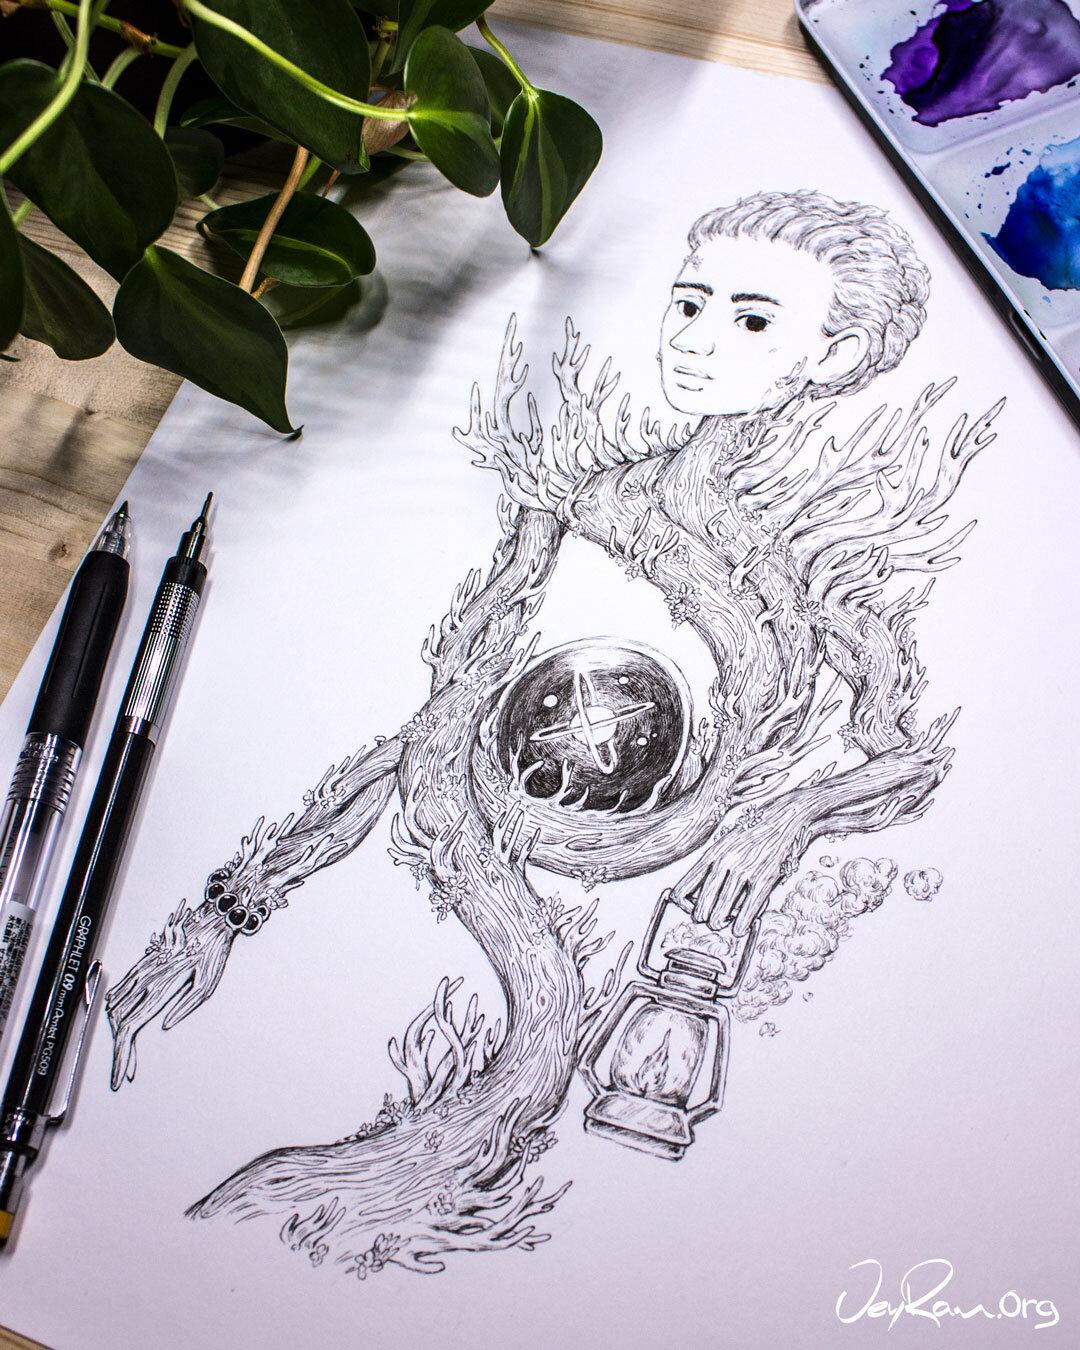 Mushroom Wizard Ink Drawing :  Ballpoint Pen Art by JeyRam. I'm an artist from Toronto that specializes in nature inspired ink drawings! #inktober #inkart #originalart #inktober2019